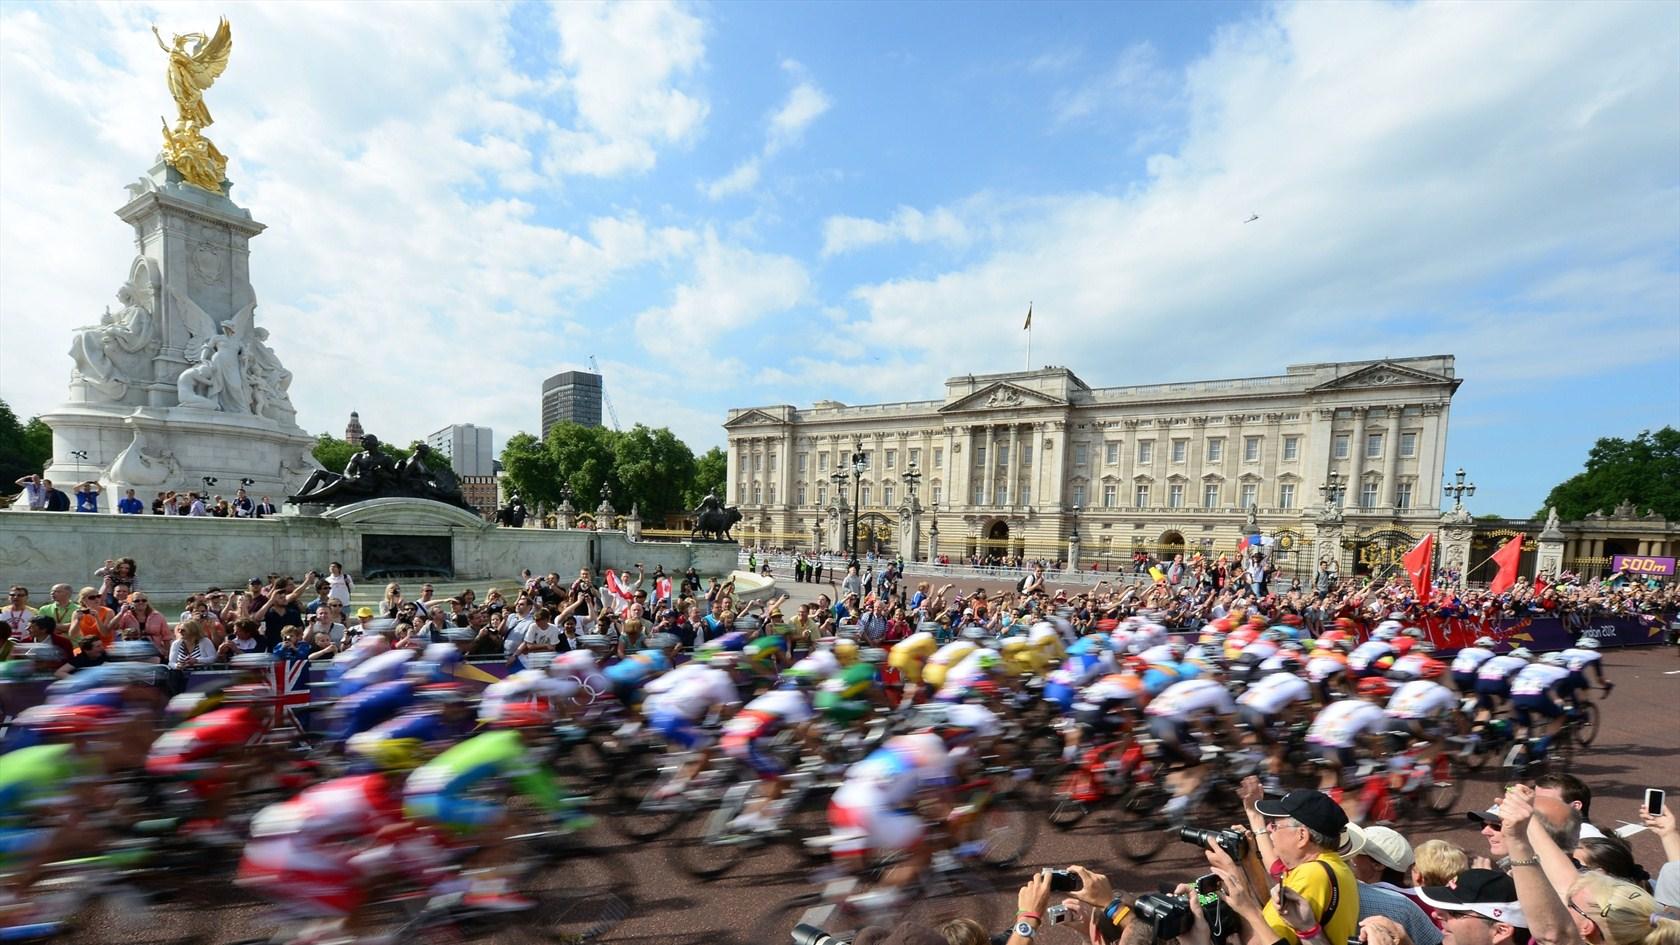 Road race men s cycling near buckingham palace